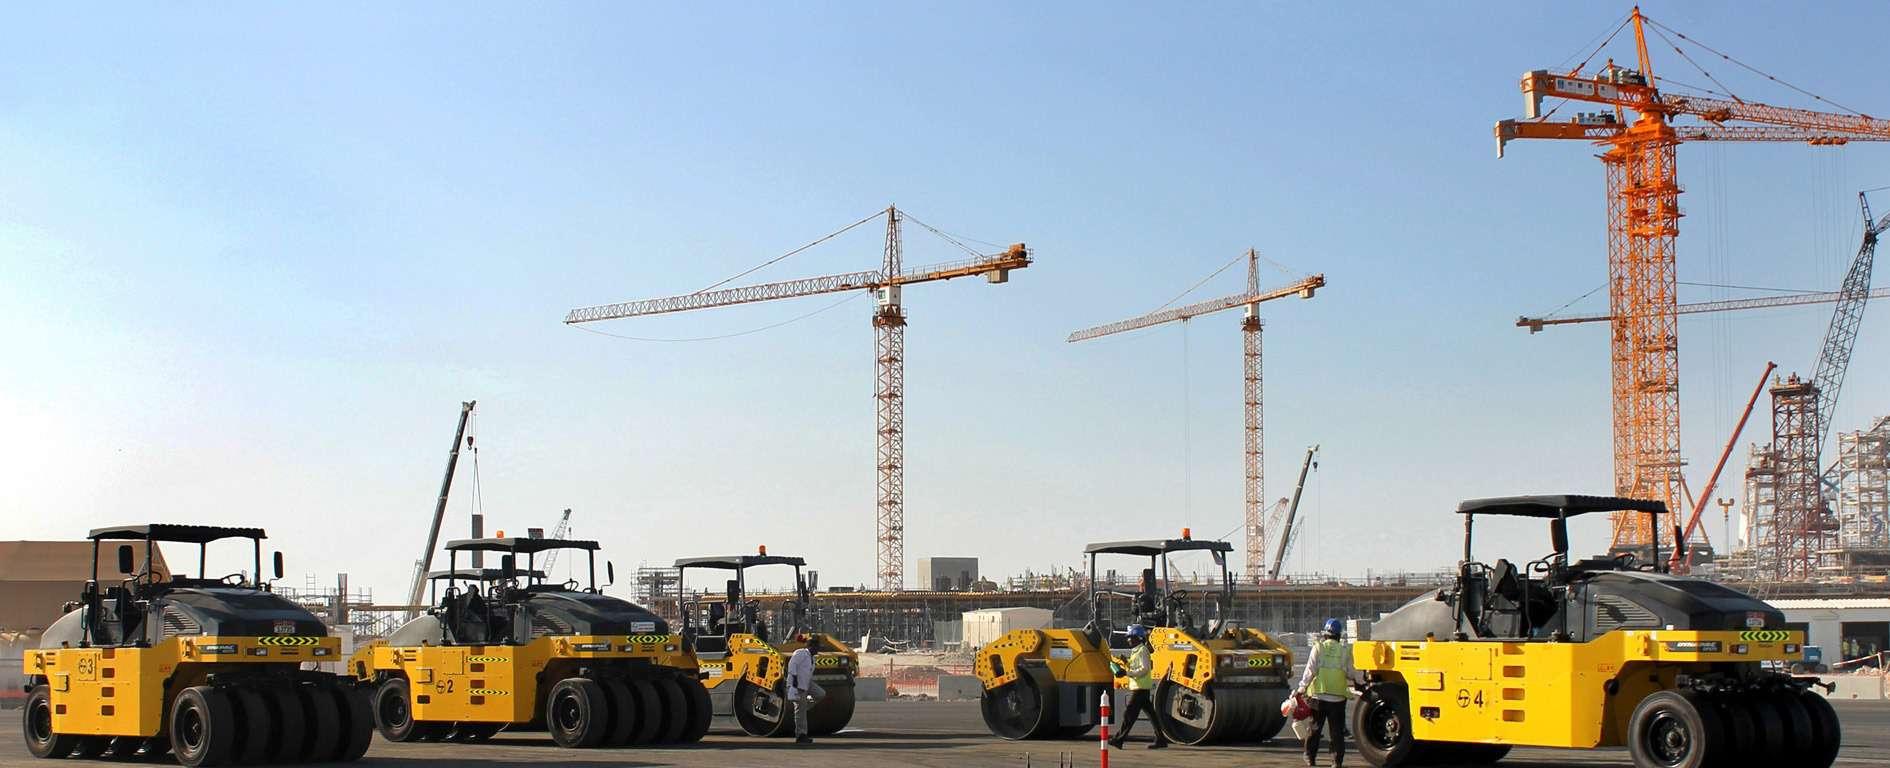 Il Midfield Airport Terminal Complex di Abu Dhabi